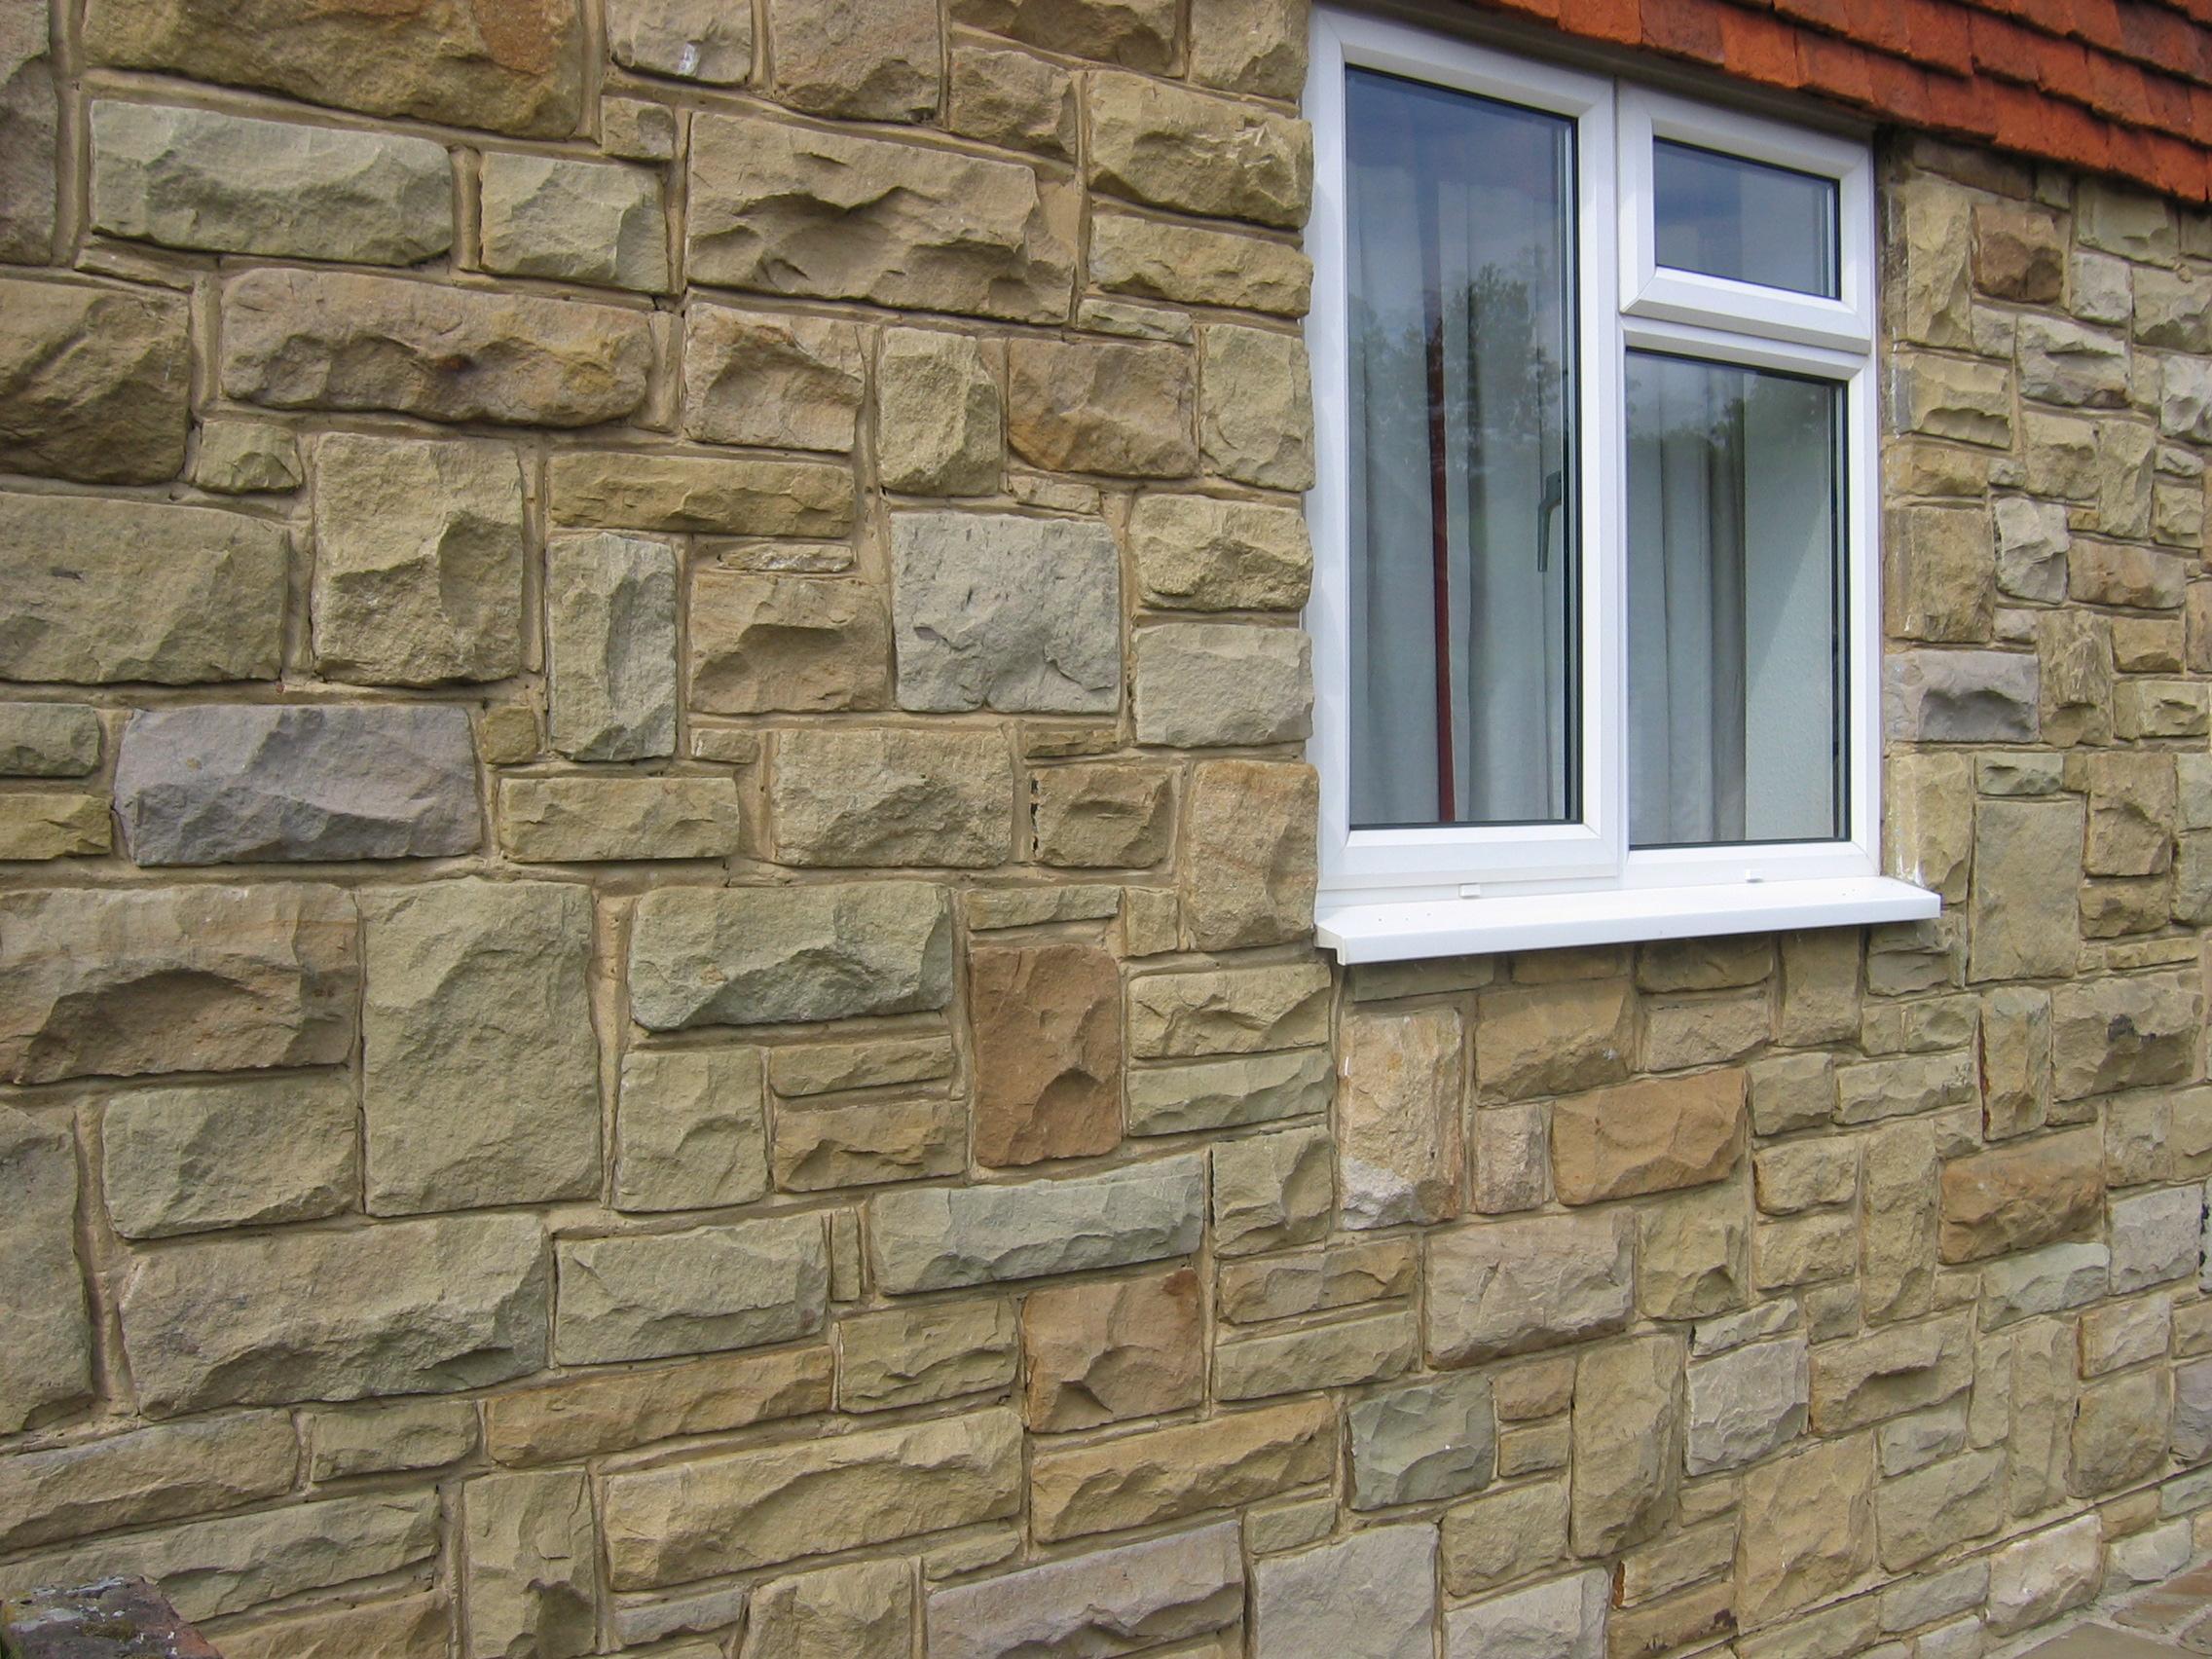 Natural Stone Product : B s natural stone products paving